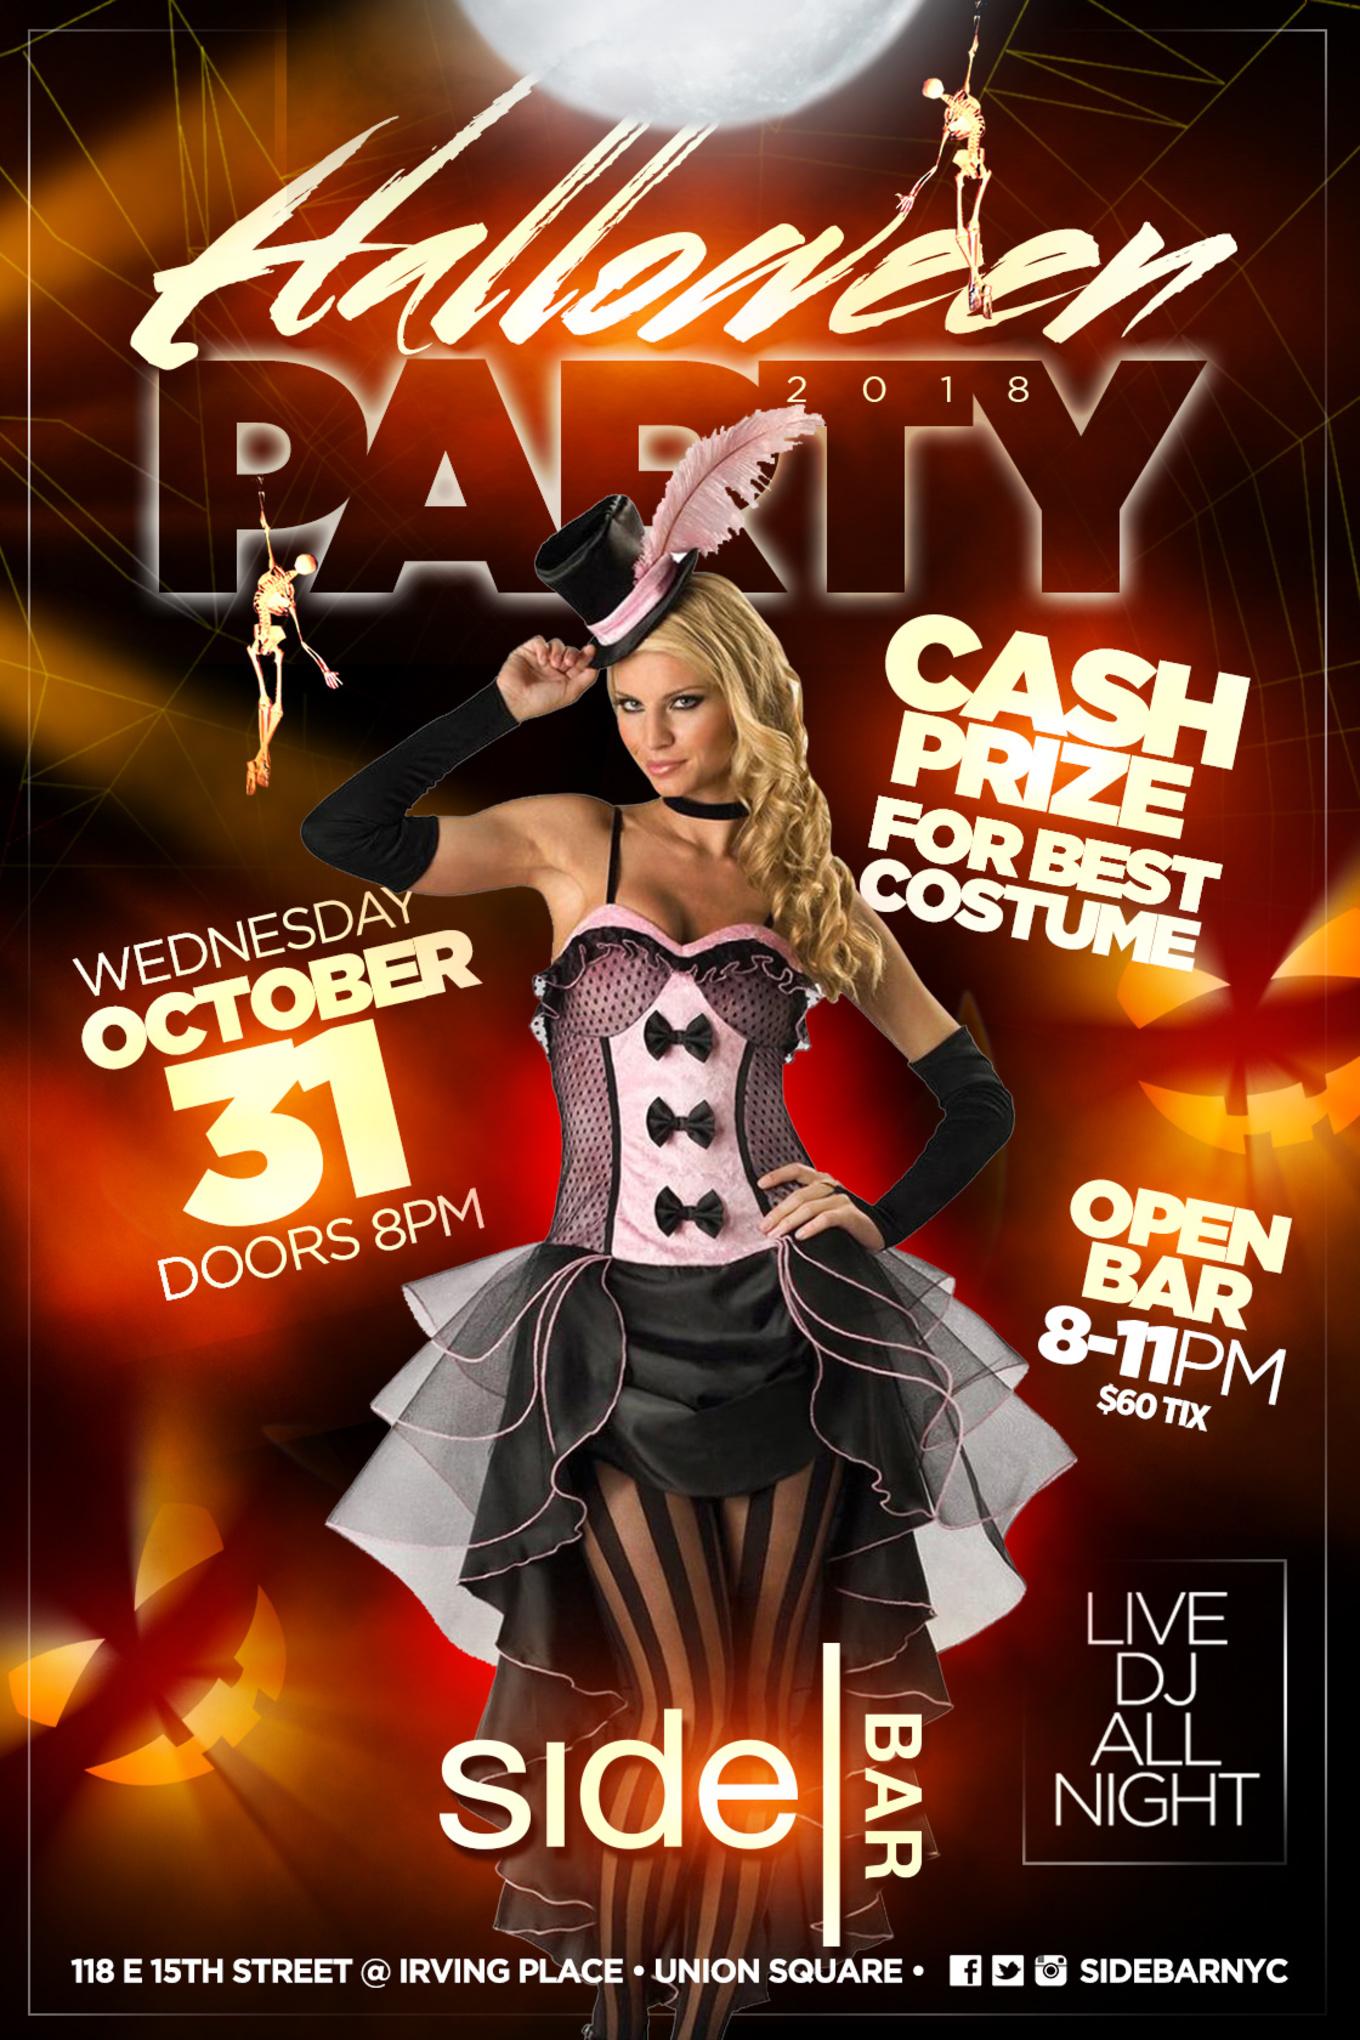 sidebar halloween party - tickets - sidebar, new york, ny - october